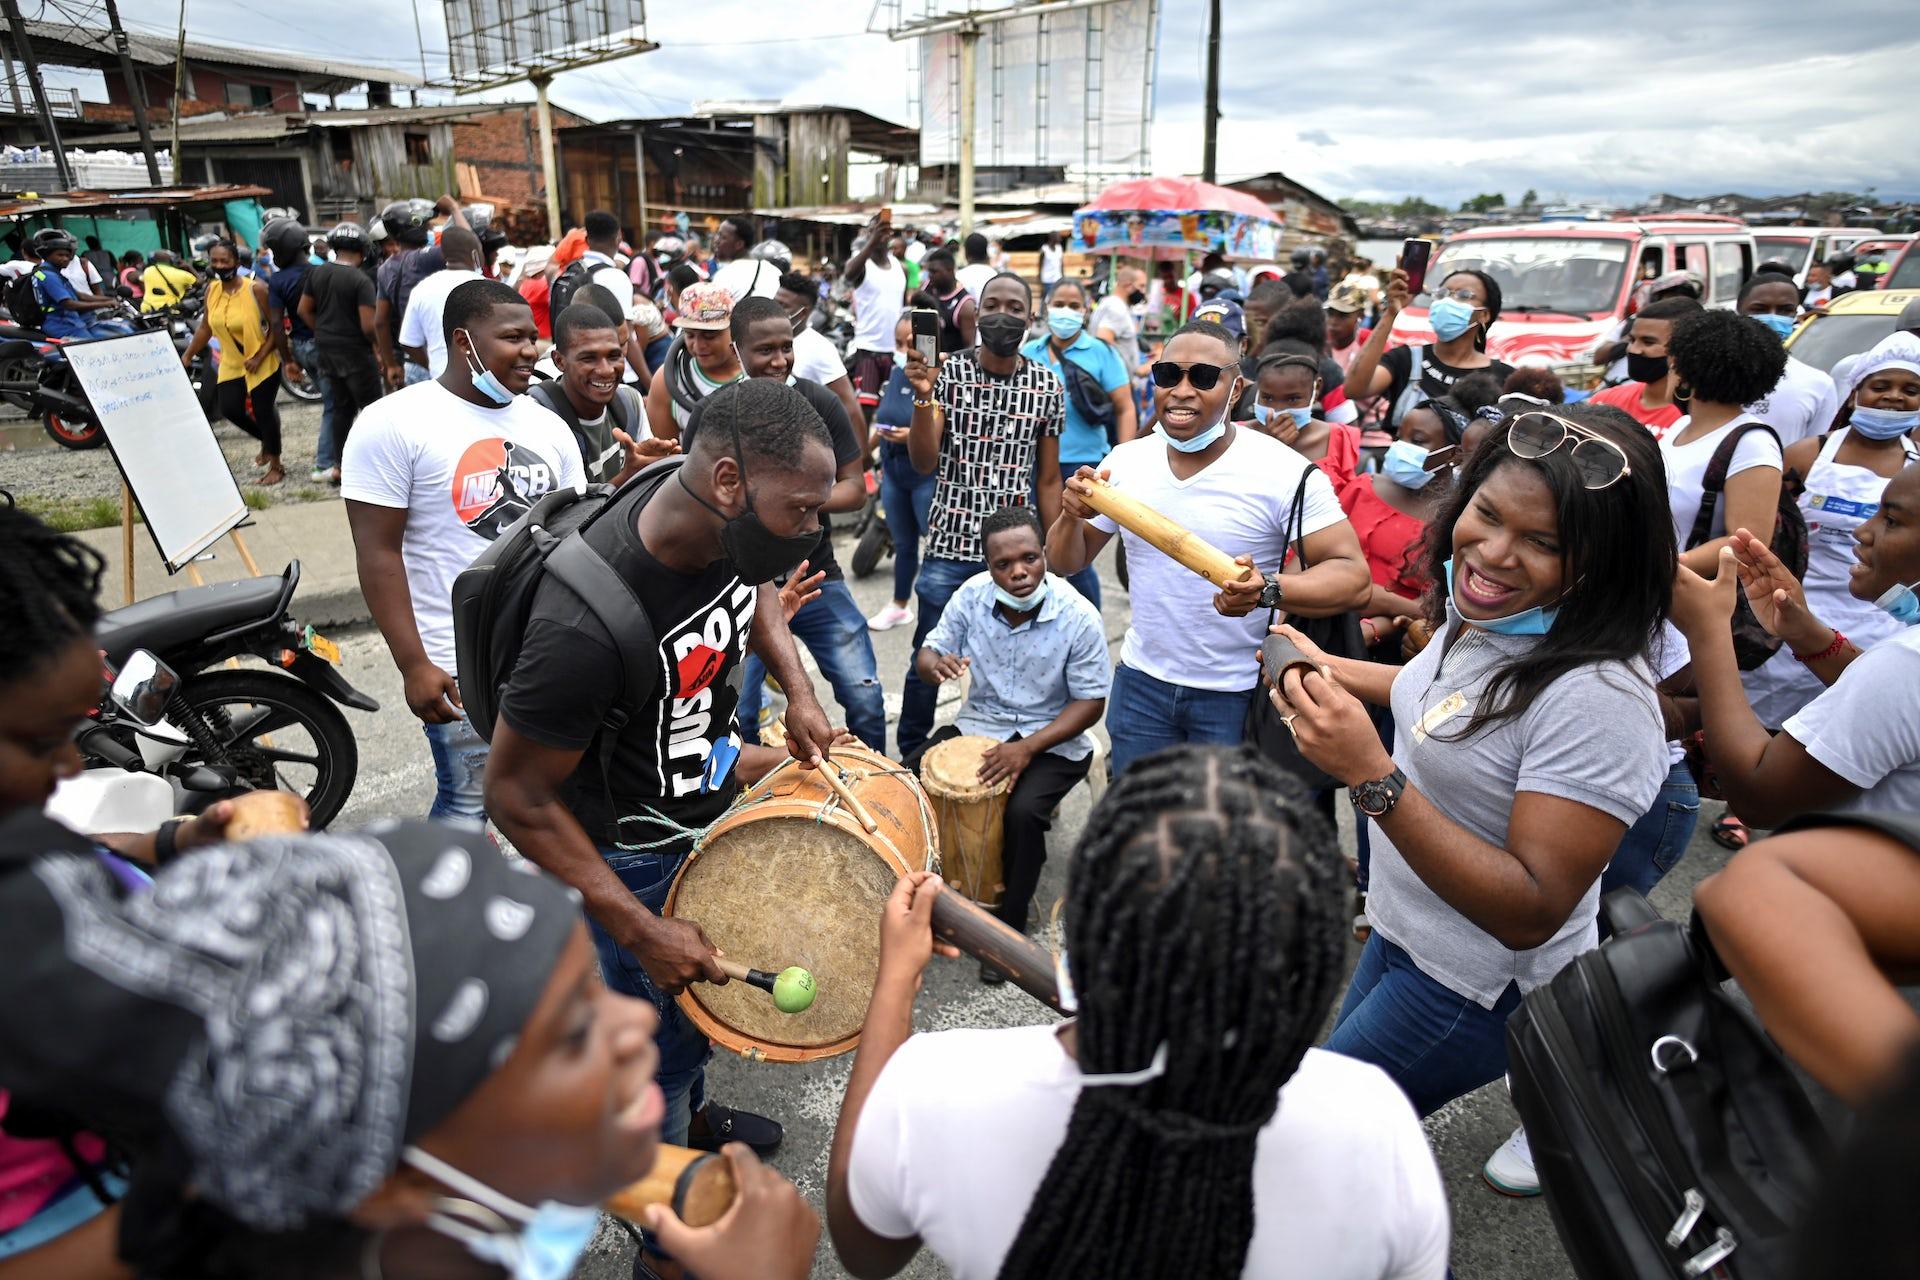 Colombian City Beset by Crime Declares 'Black Lives Matter'